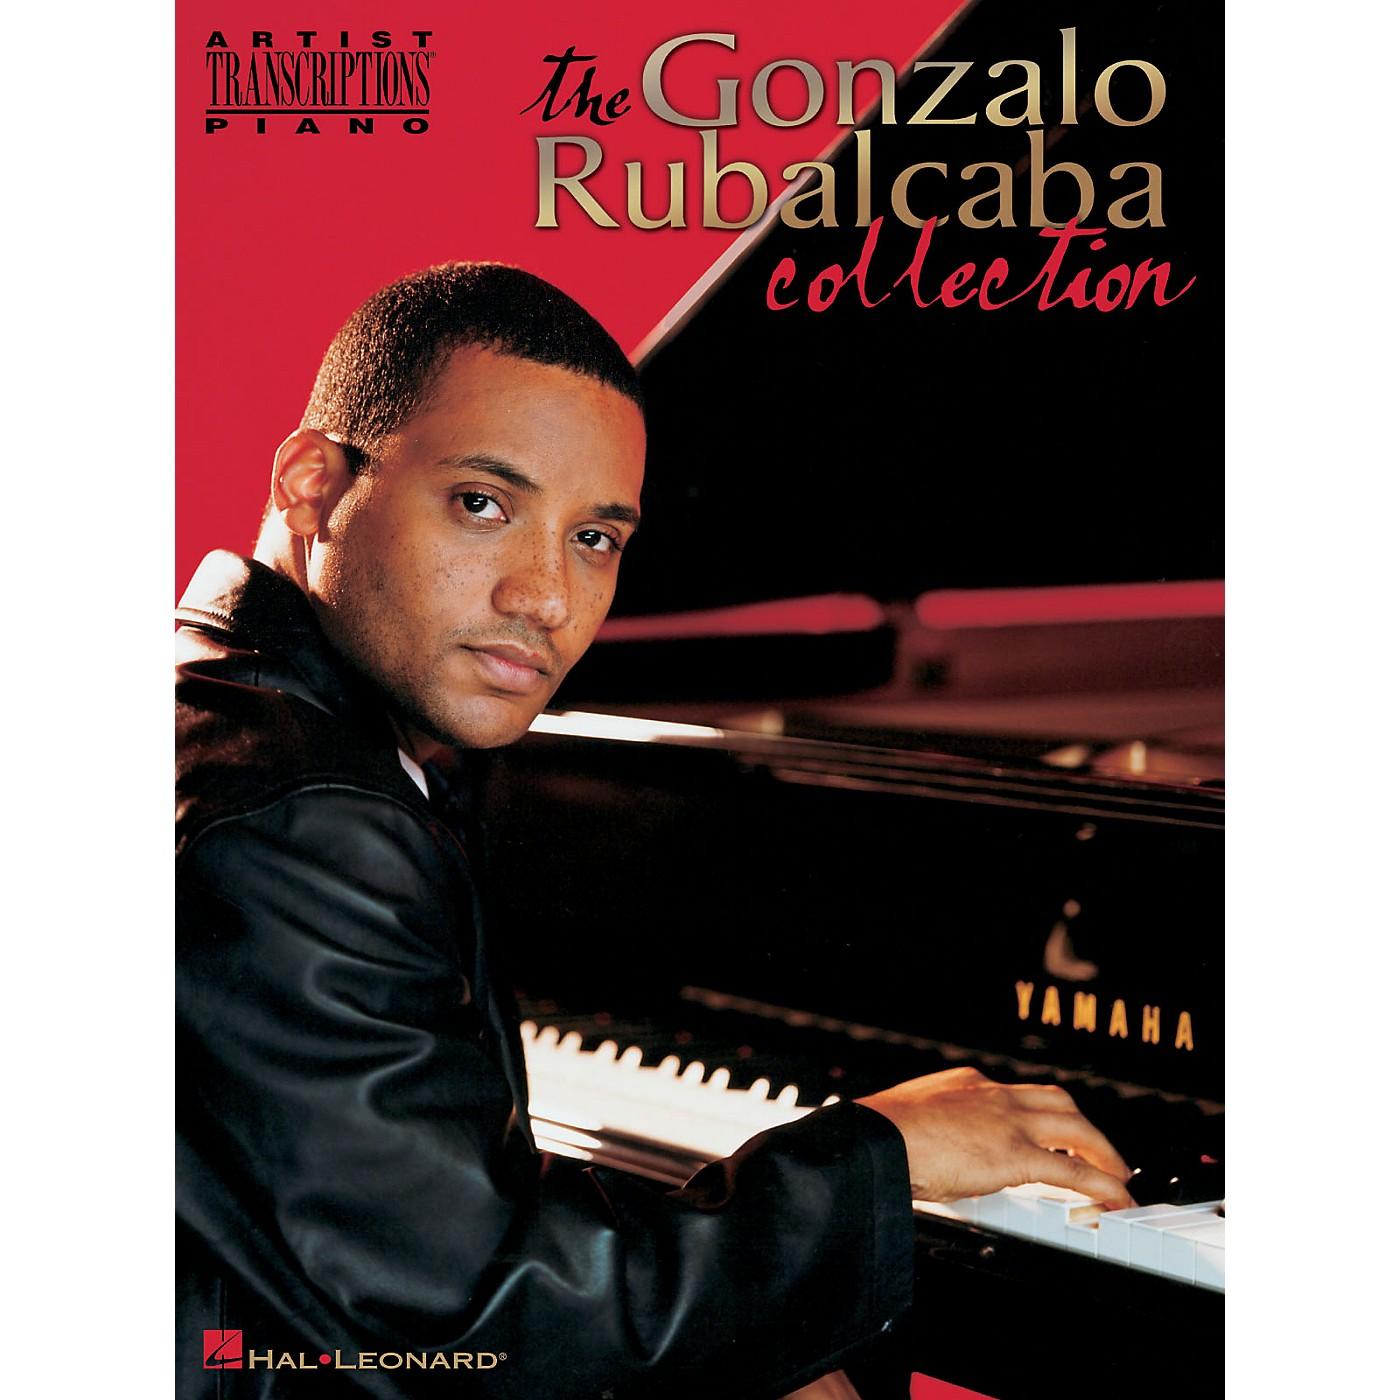 Hal Leonard Gonzalo Rubalcaba Collection Artist Transcriptions Series Performed by Gonzalo Rubalcaba thumbnail